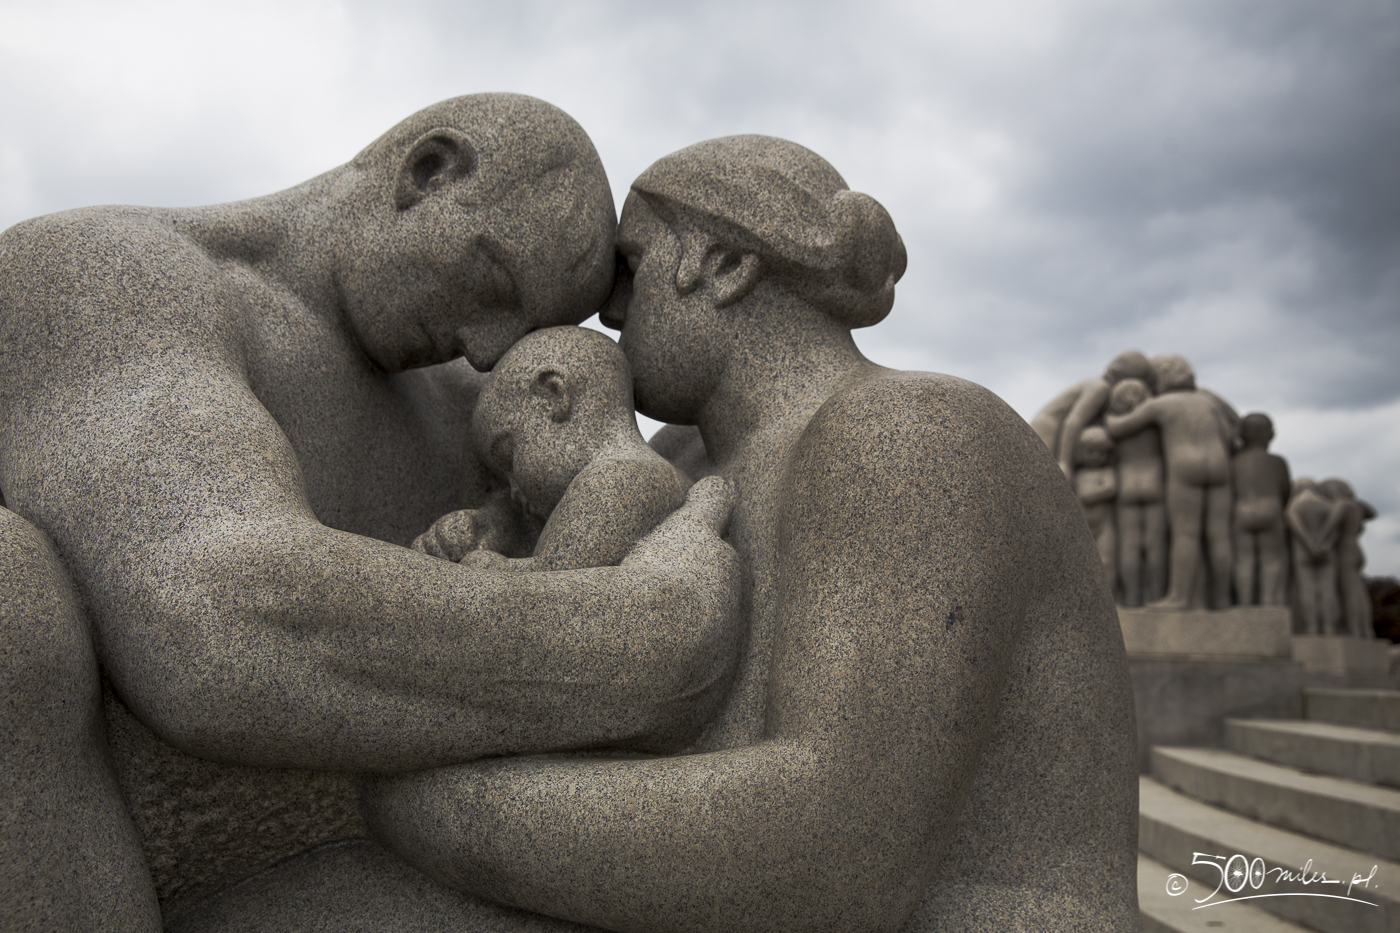 Oslo - Vigeland Park - granith sculptures